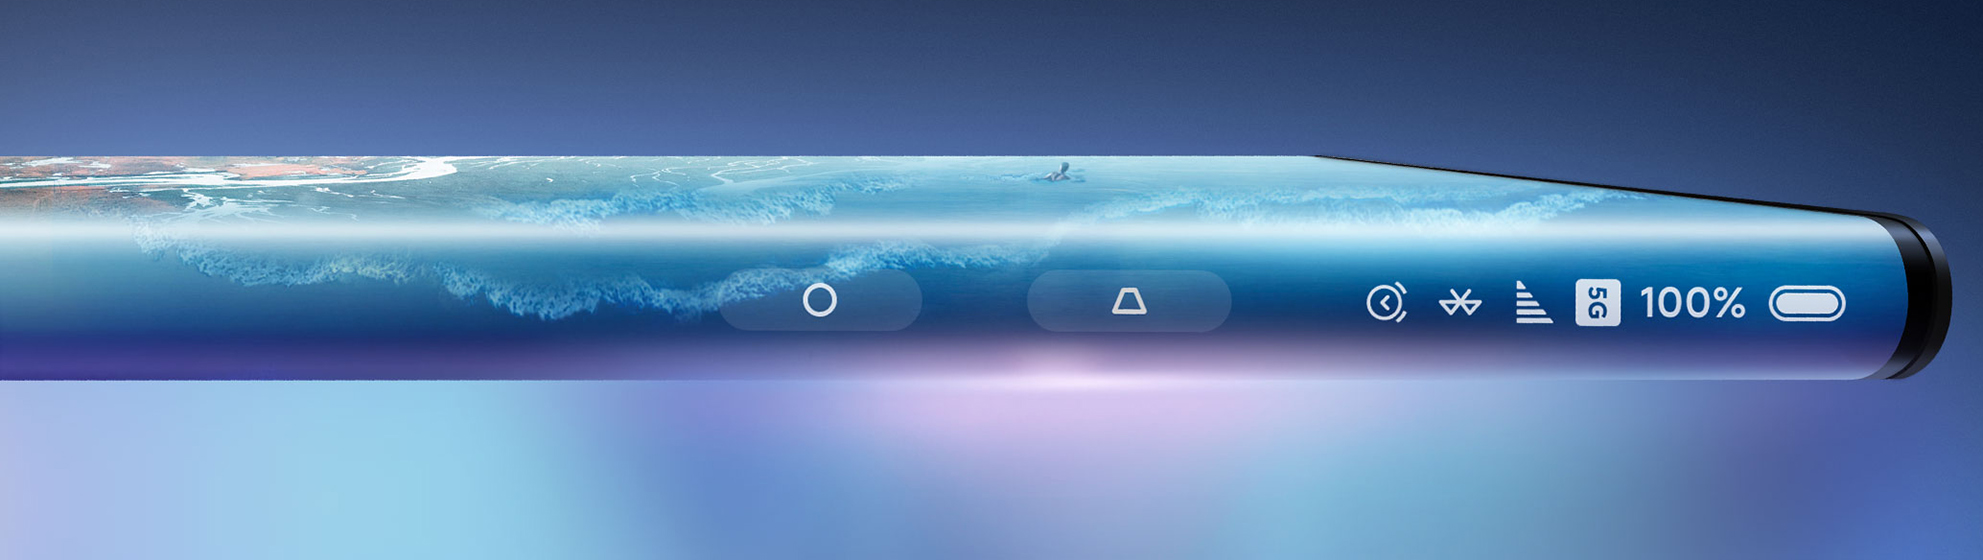 Xiaomi Mi MIX Alpha - Bordes